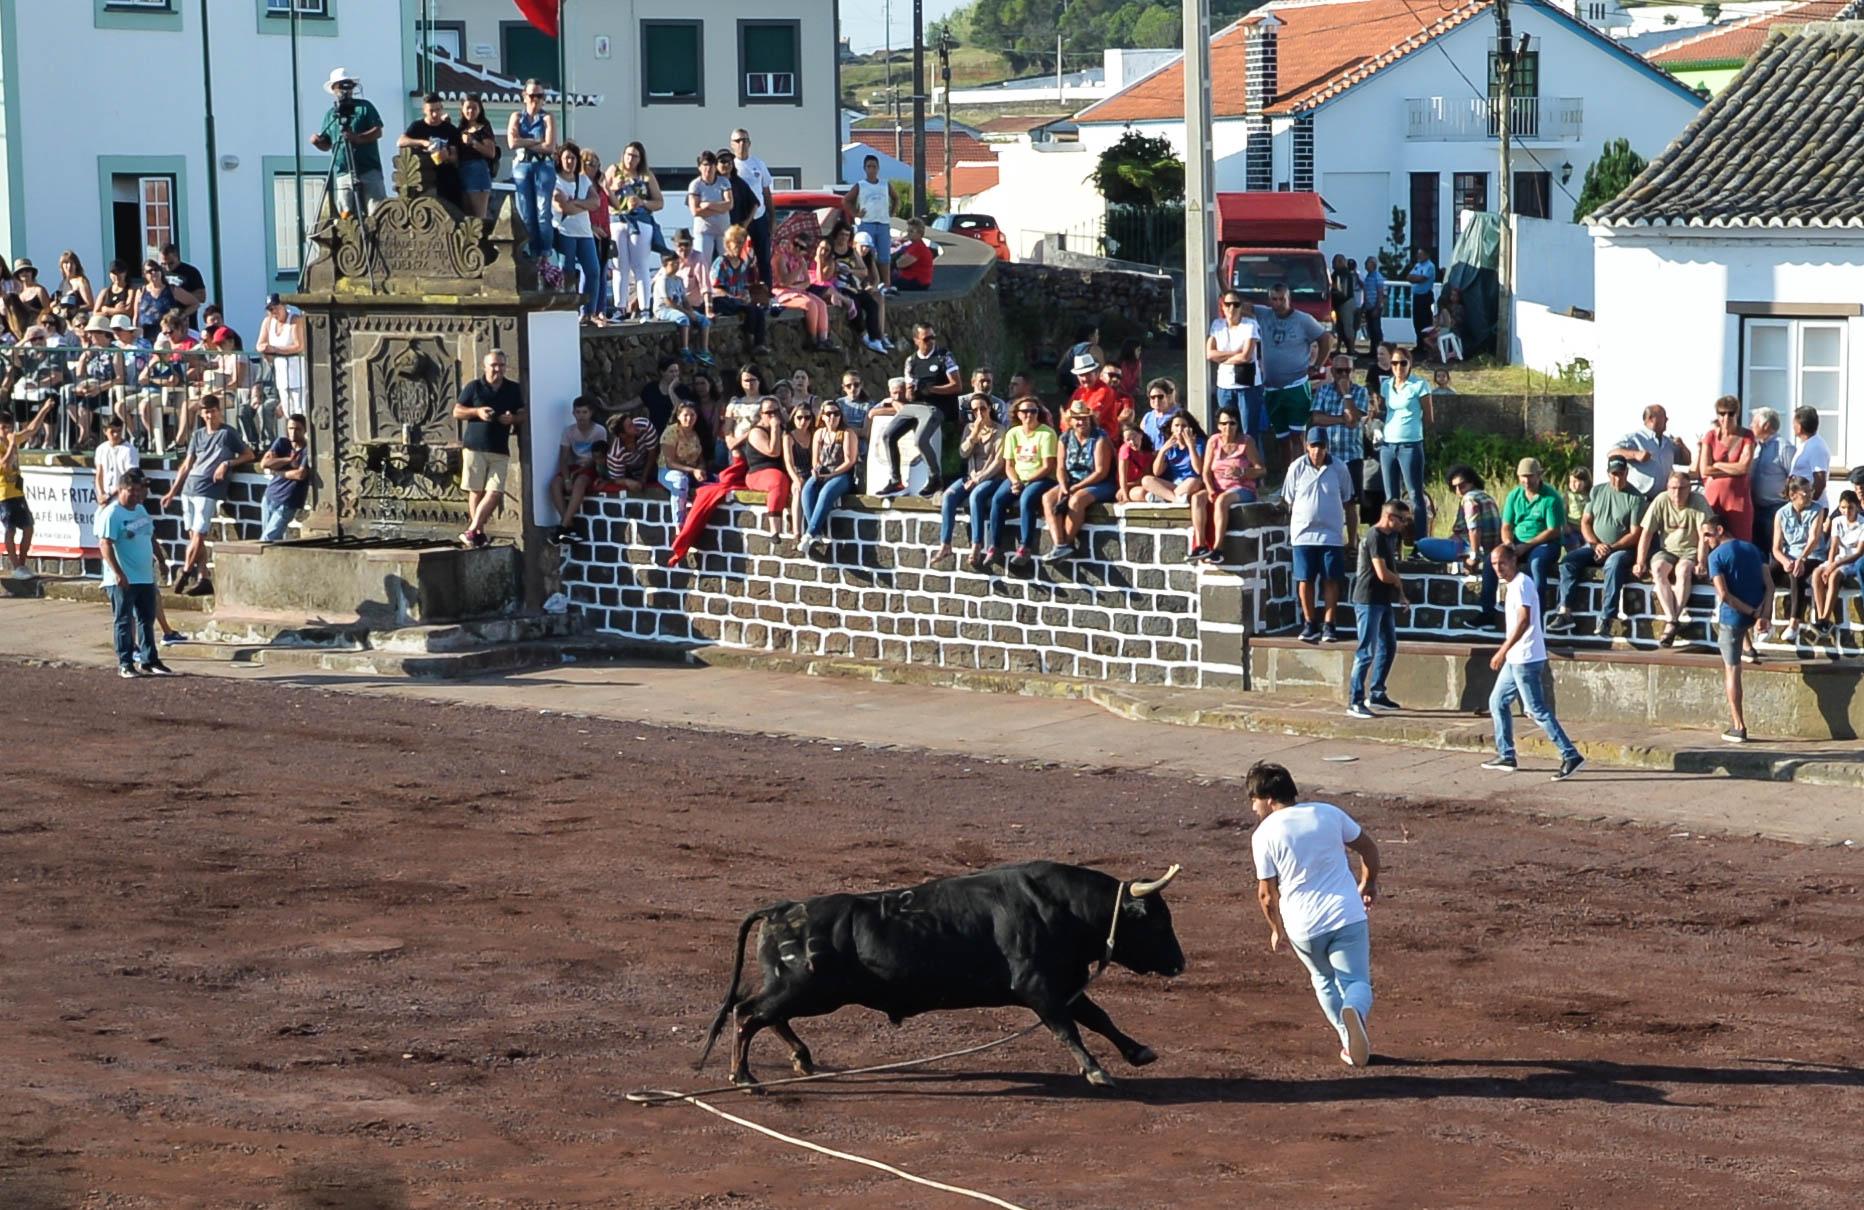 Acores, Terceira, Sao Sebastiao...